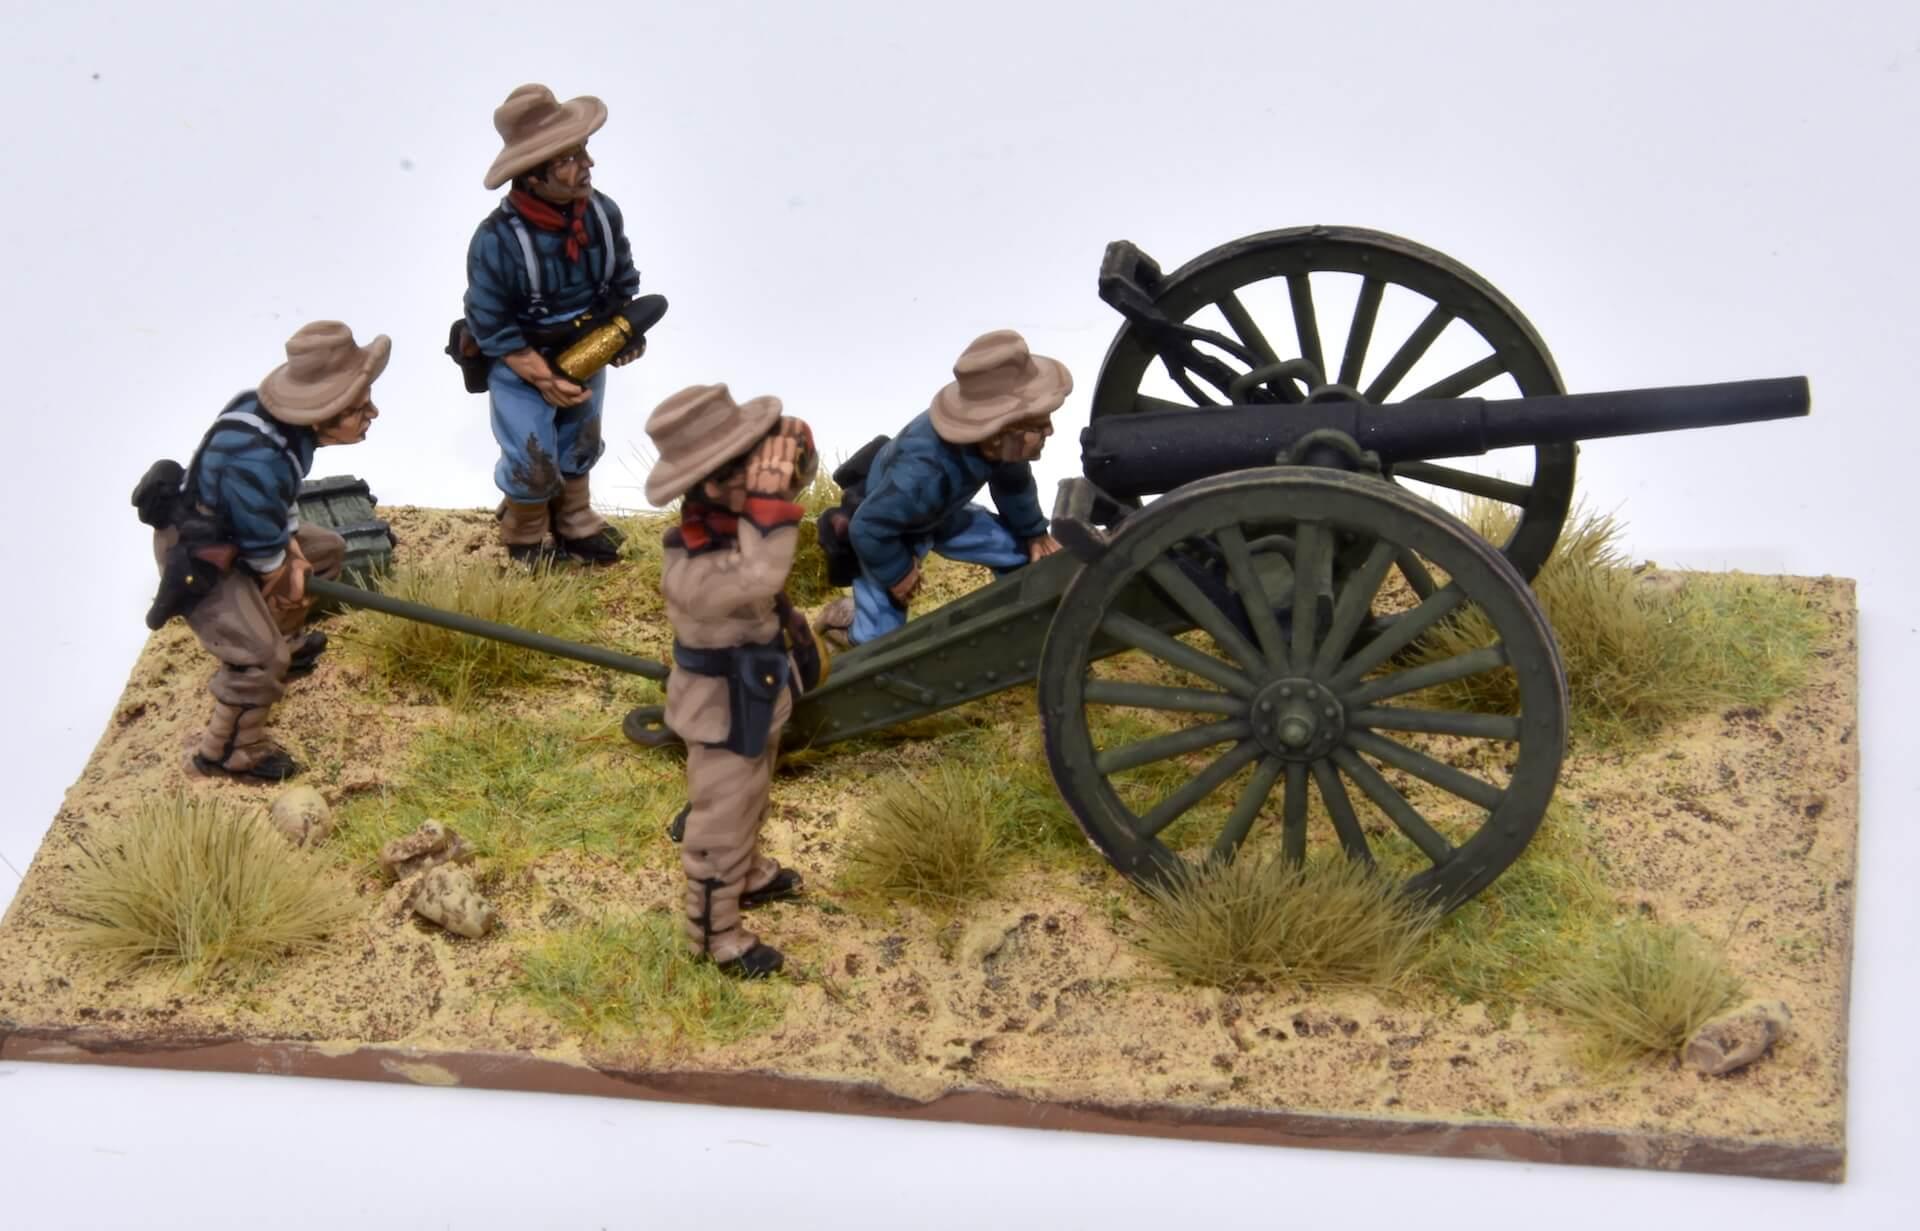 M1897 3.2-inch field gun cañón de campaña M1897 de 3,2